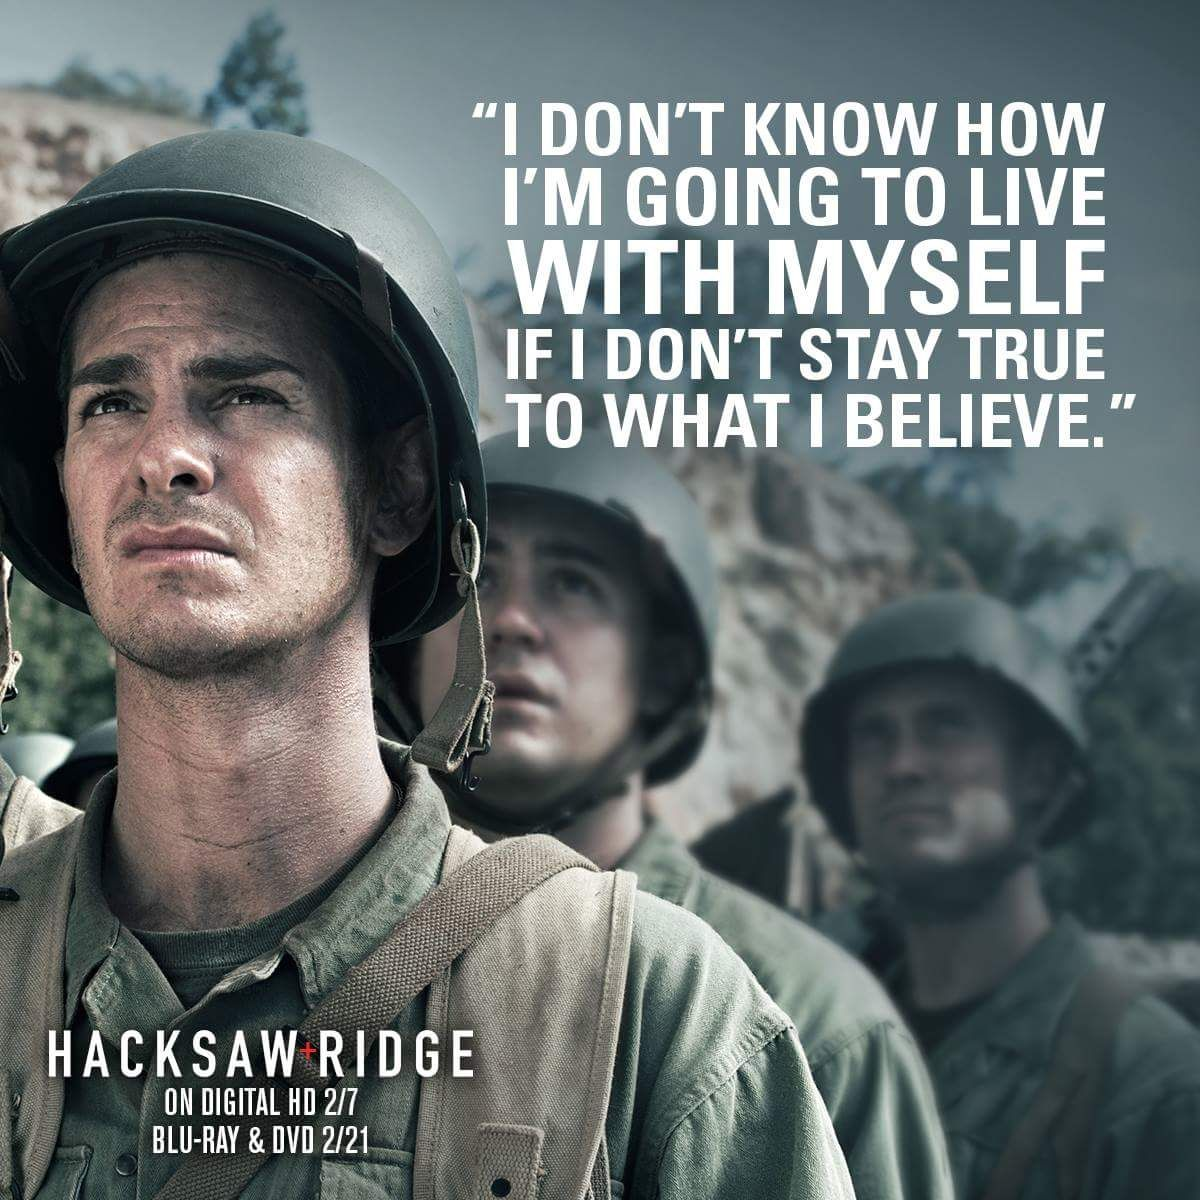 Desmond Doss Hacksaw Ridge Hacksaw Ridge Movie Quotes Quotes To Live By